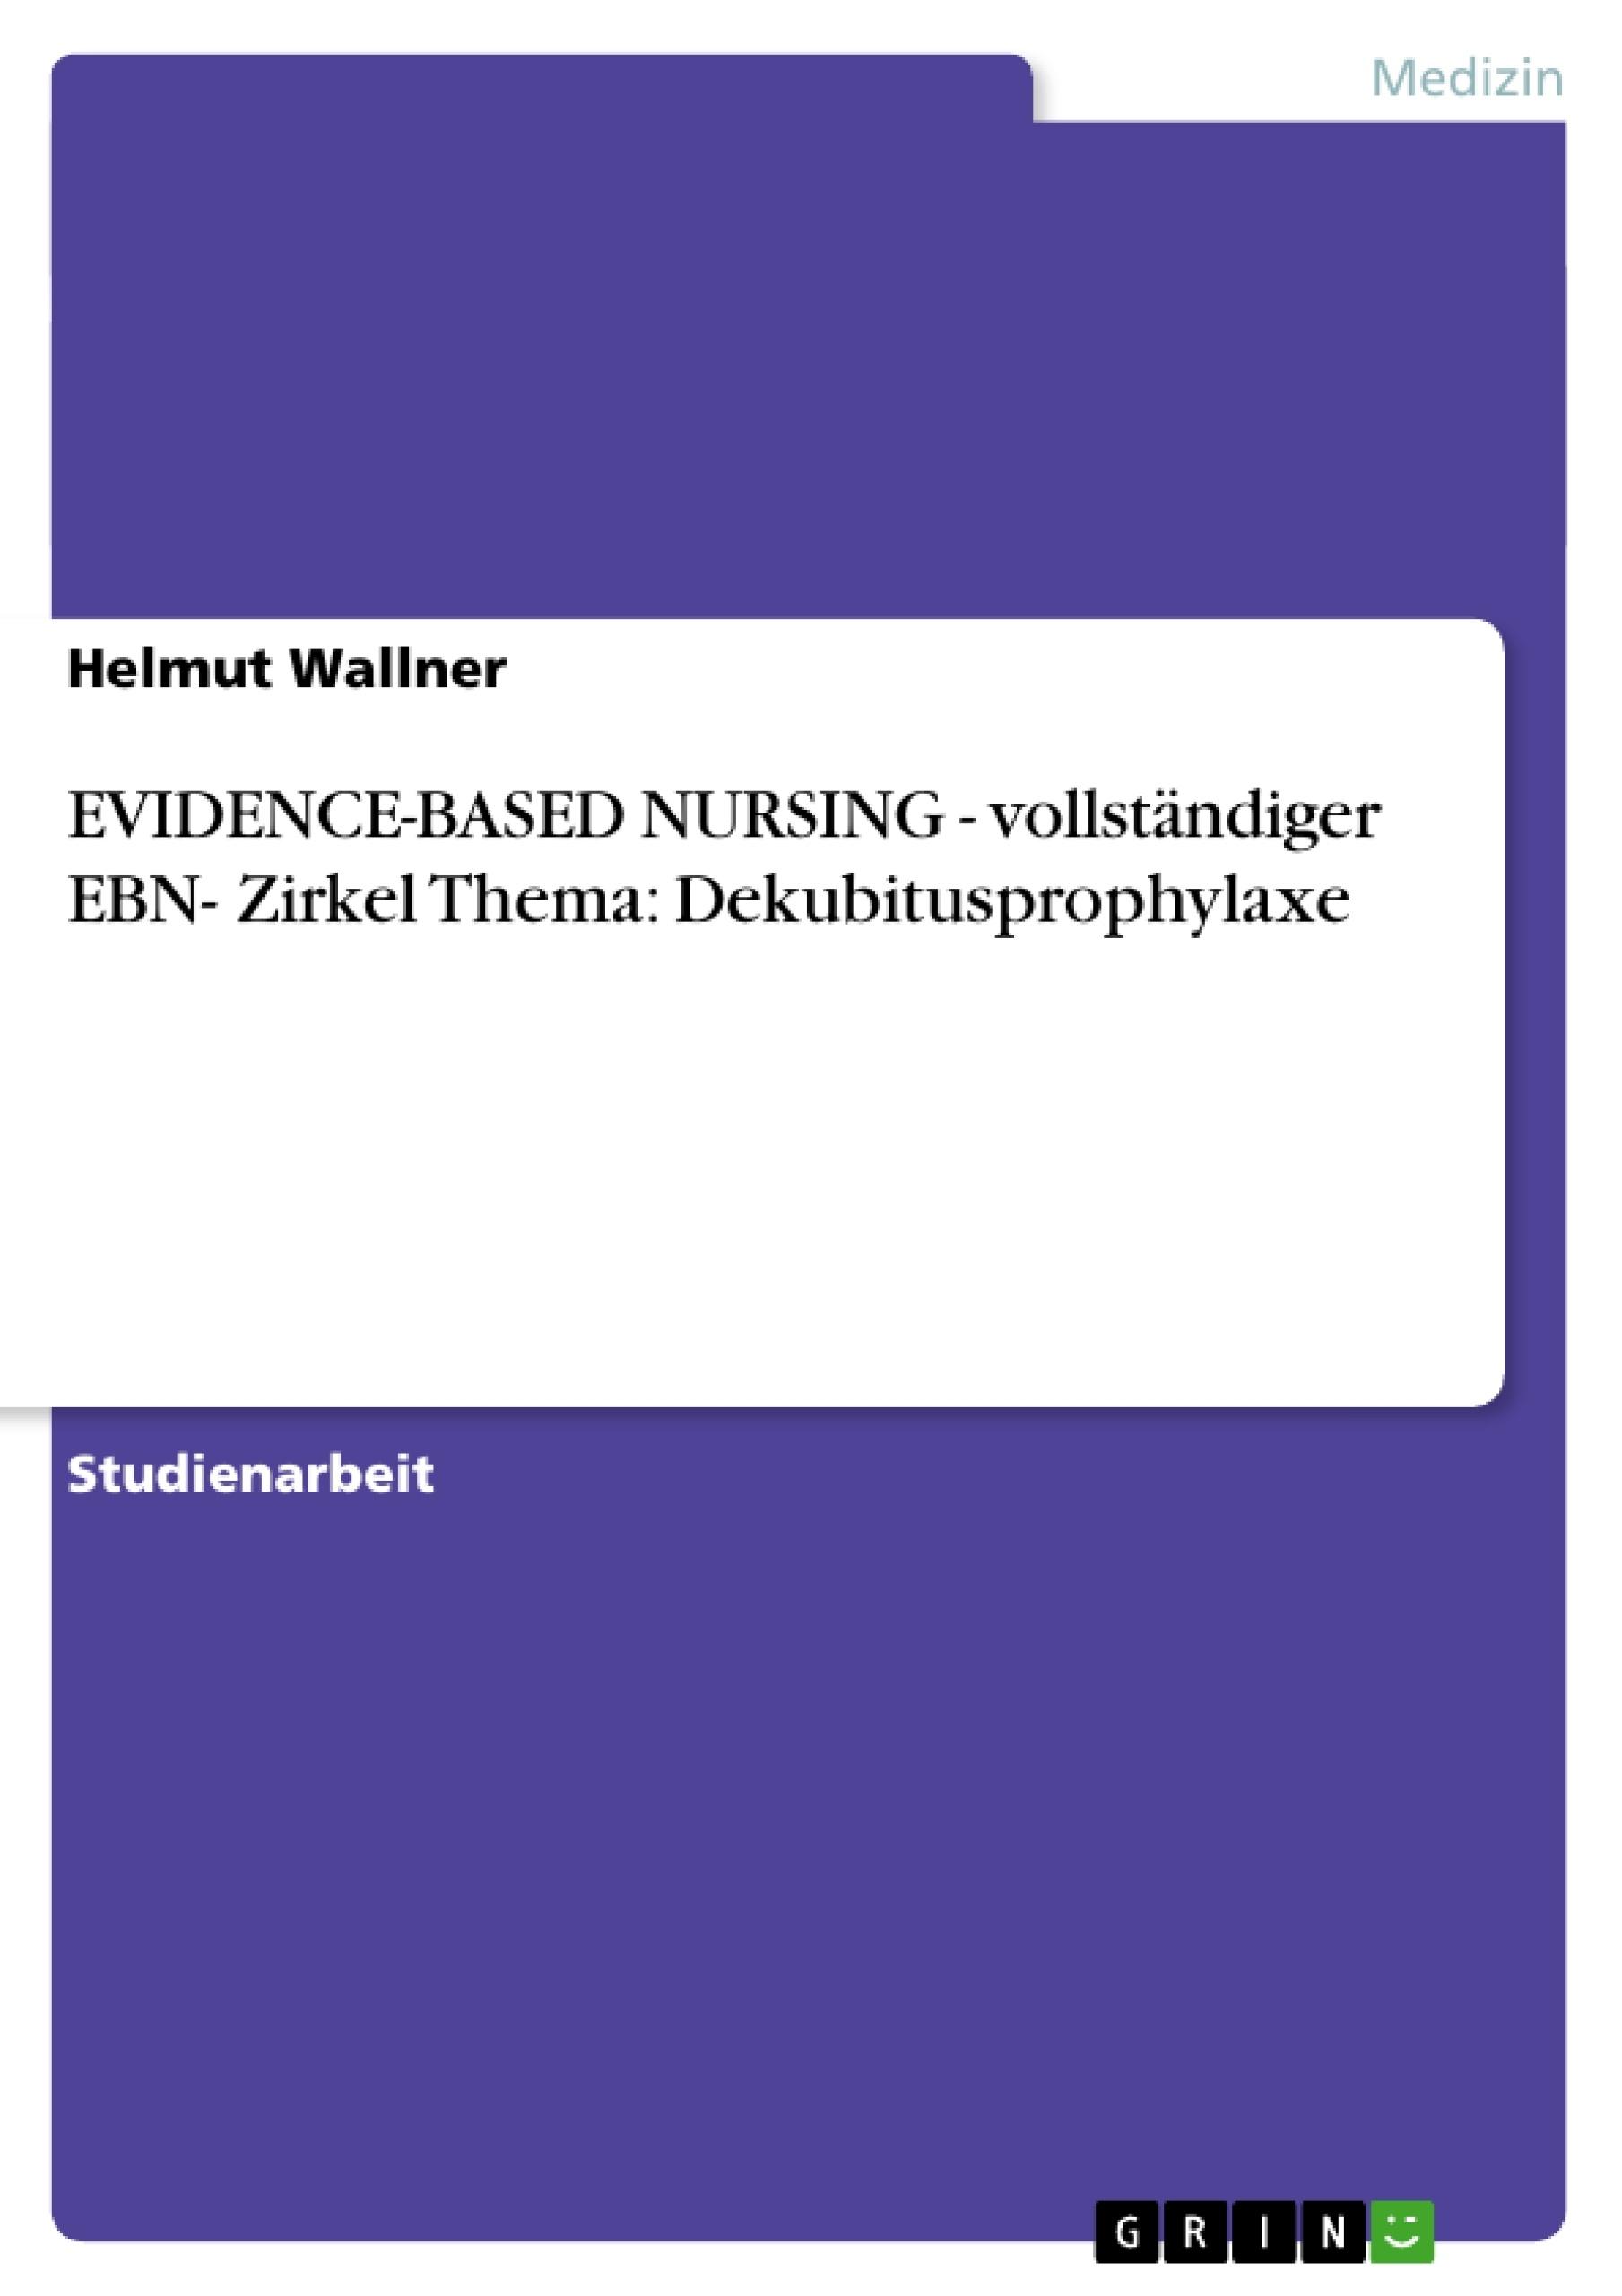 Titel: EVIDENCE-BASED NURSING  -  vollständiger EBN- Zirkel Thema: Dekubitusprophylaxe